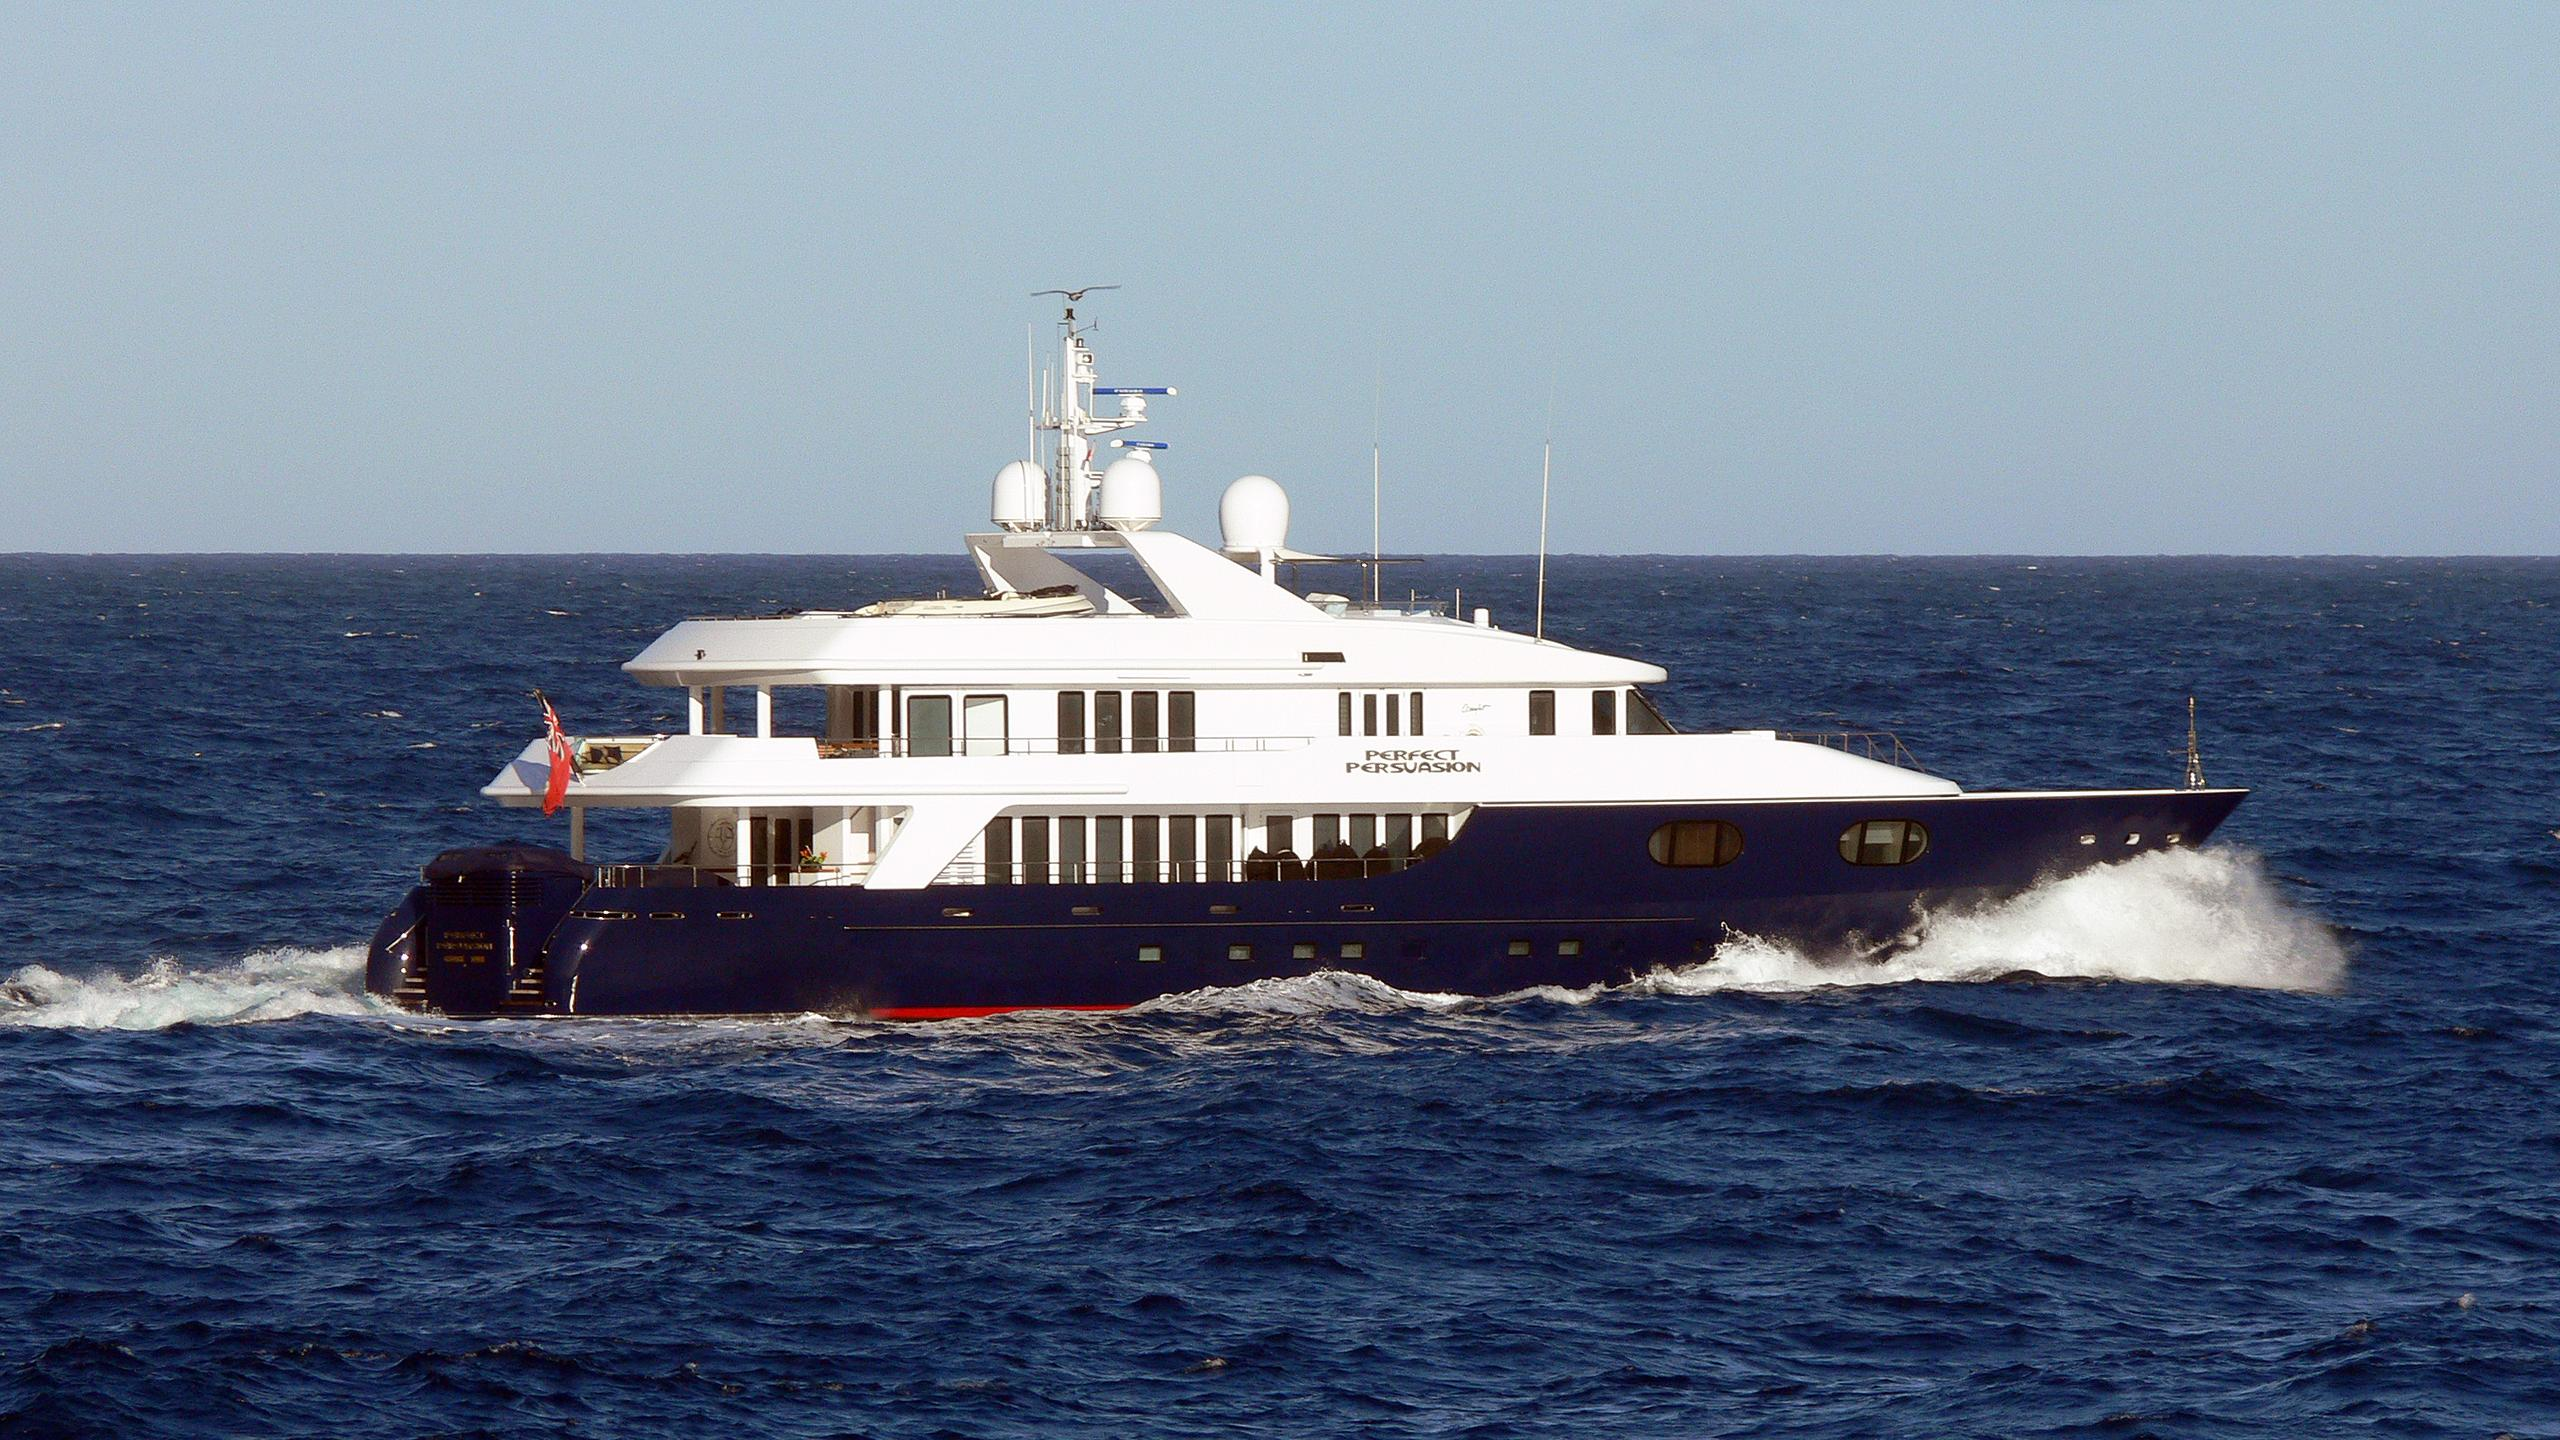 perfect-persuasion-motor-yacht-oceanfast-1997-46m-cruising-profile